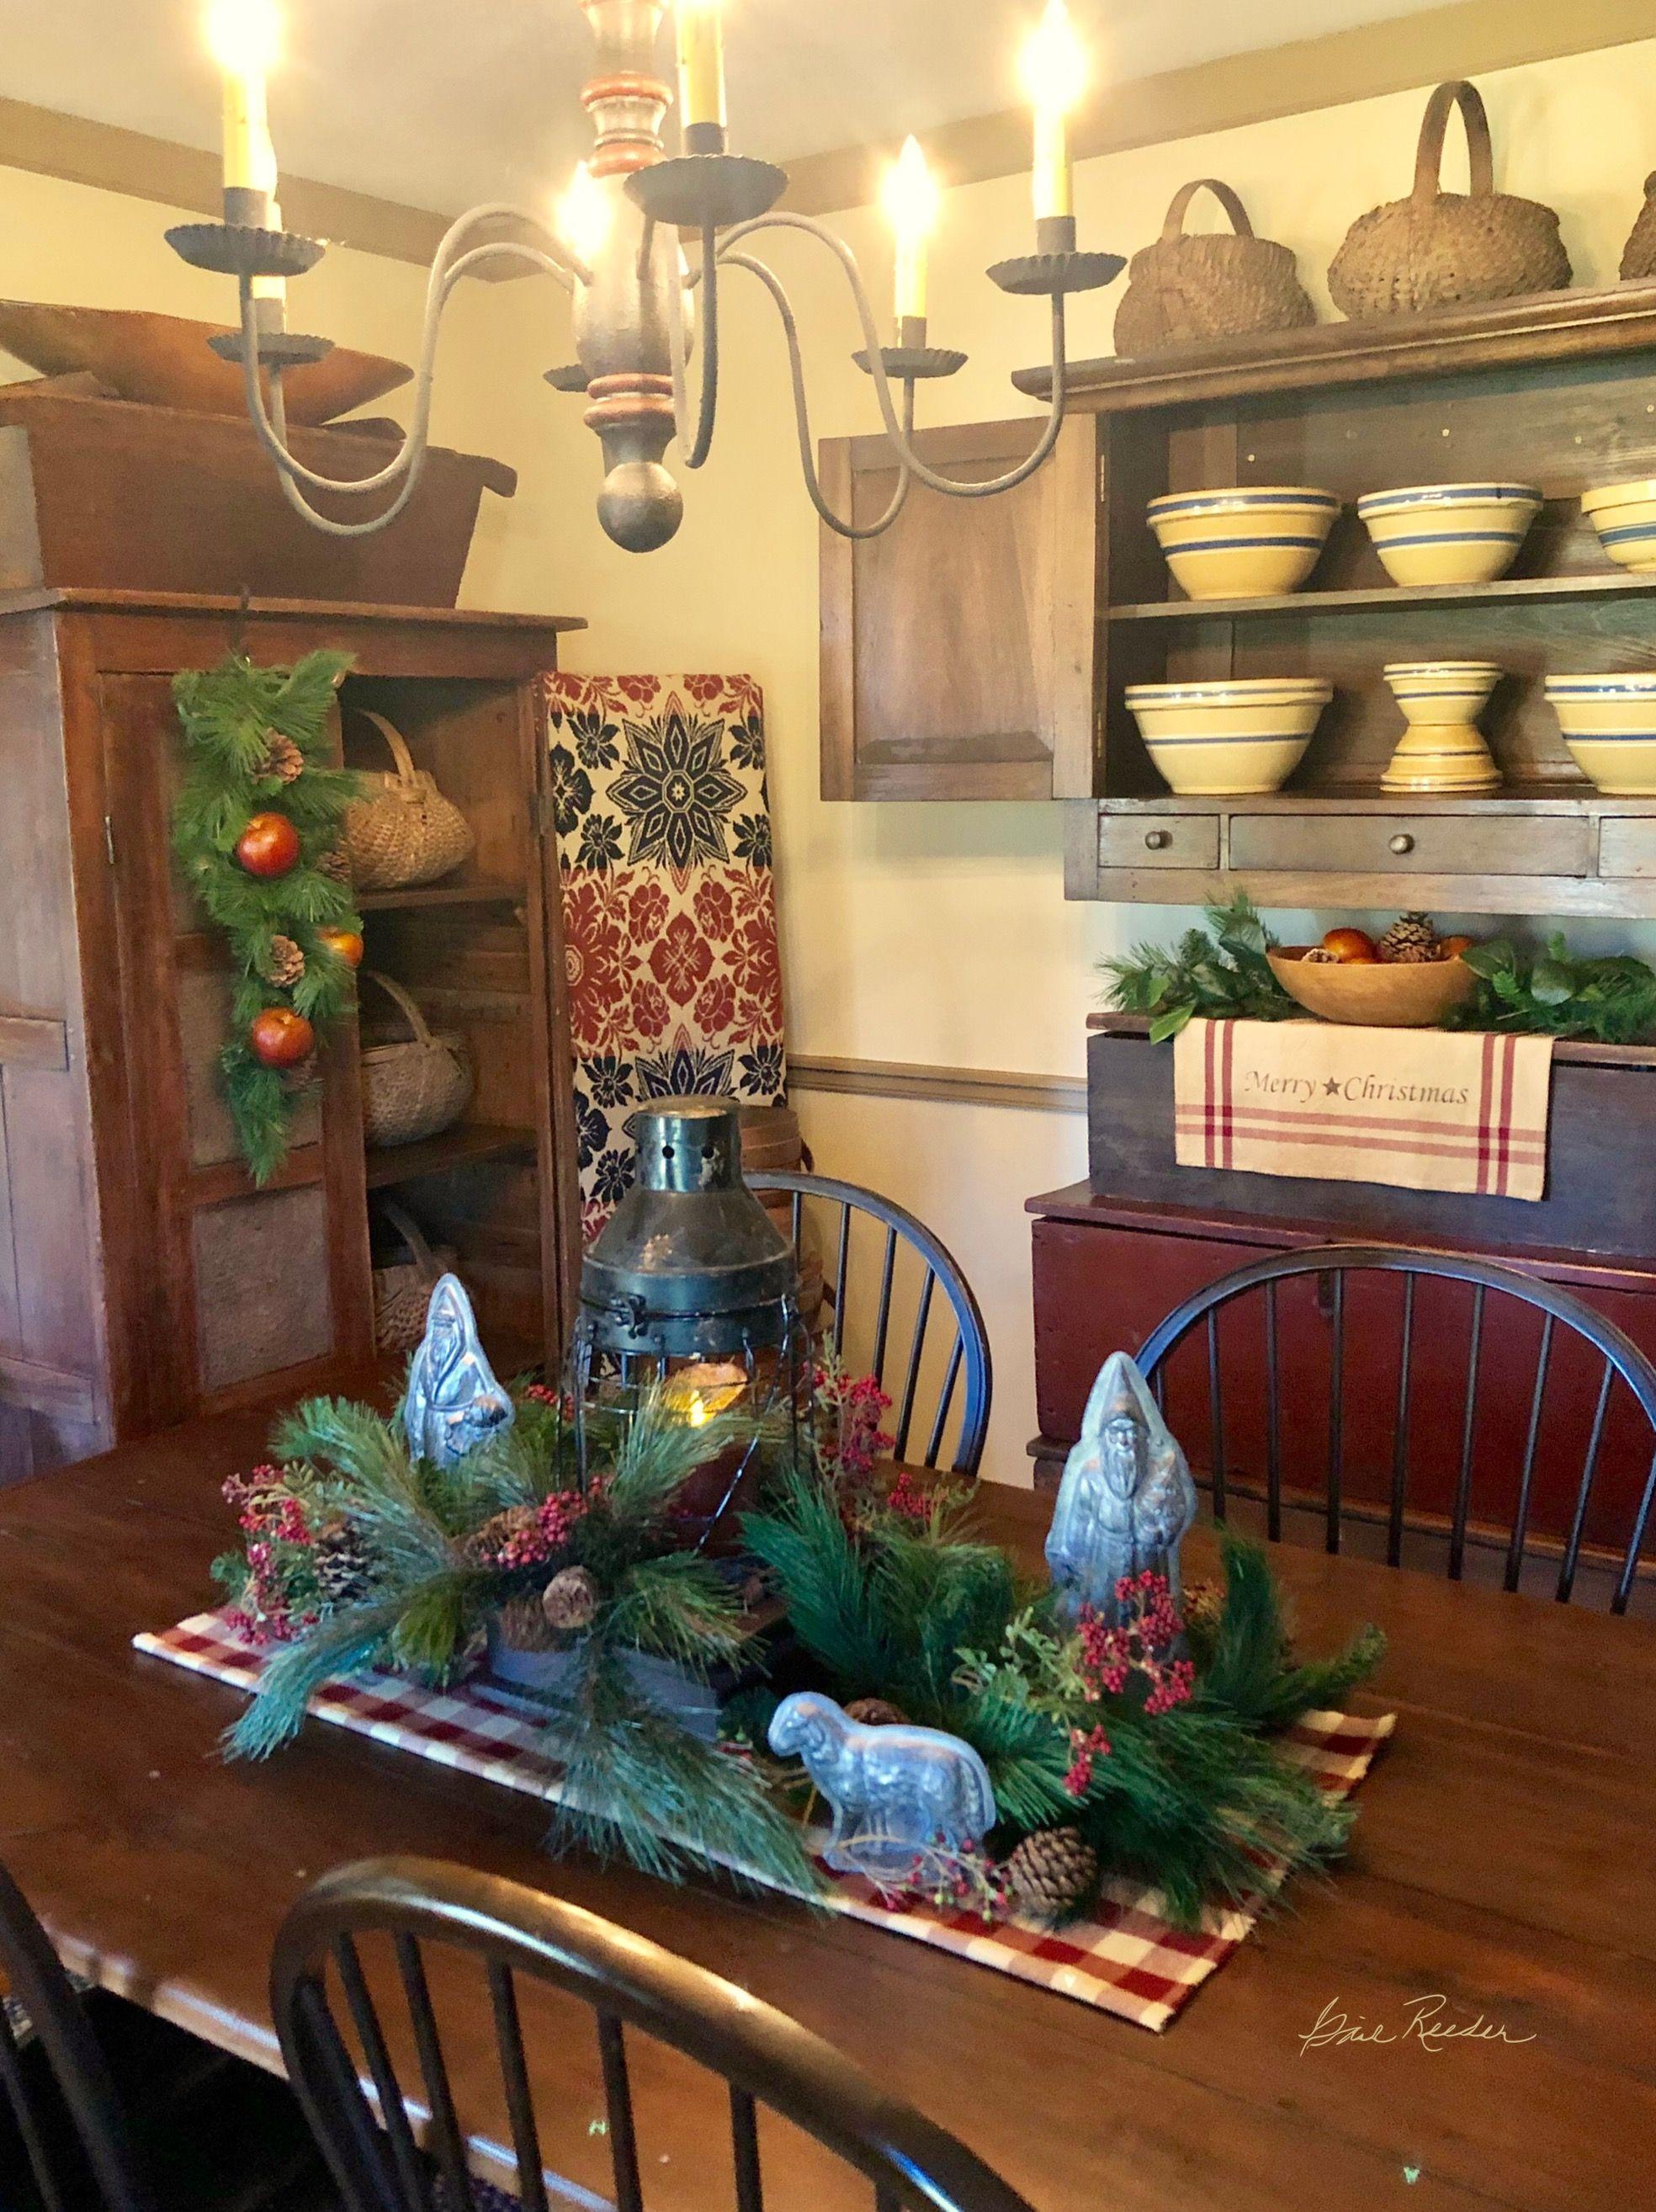 Pin By Linda Ecker On Gail Reeder Home Inspiration Primitive Dining Rooms Primitive Christmas Primitive Decorating